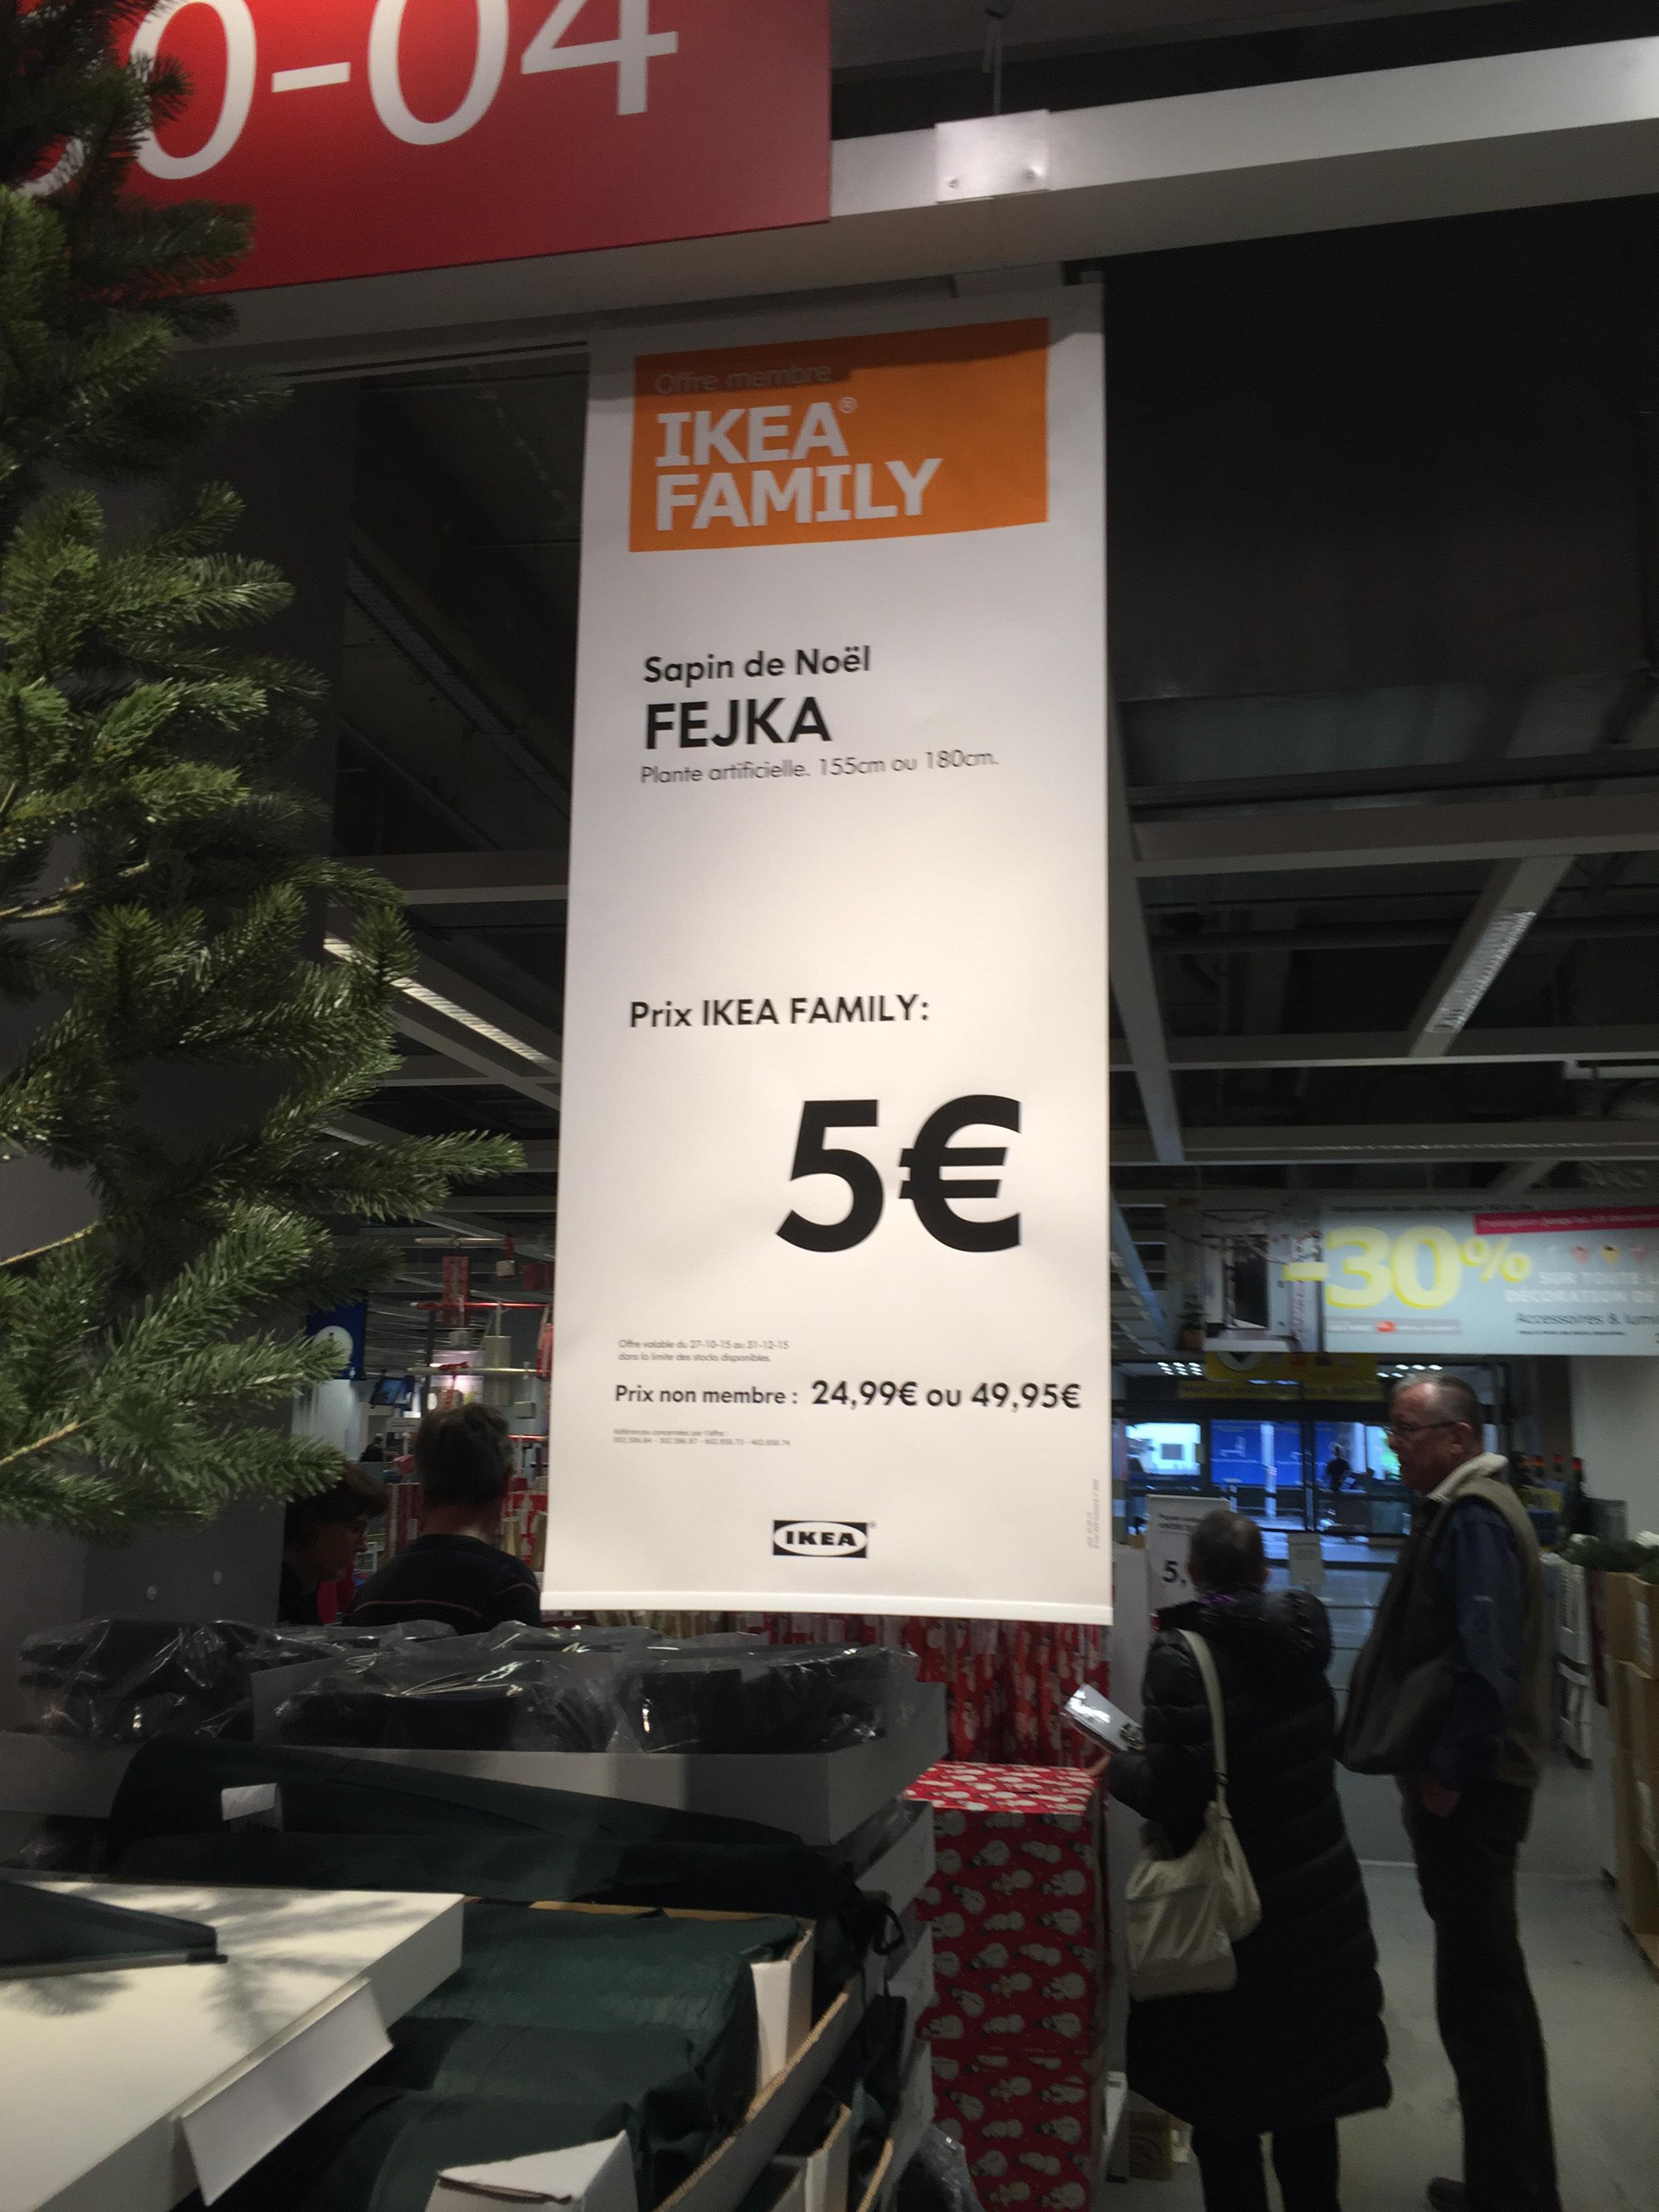 [Ikea Family] Sapin de Noël artificiel Fejka (155 ou 180 cm)